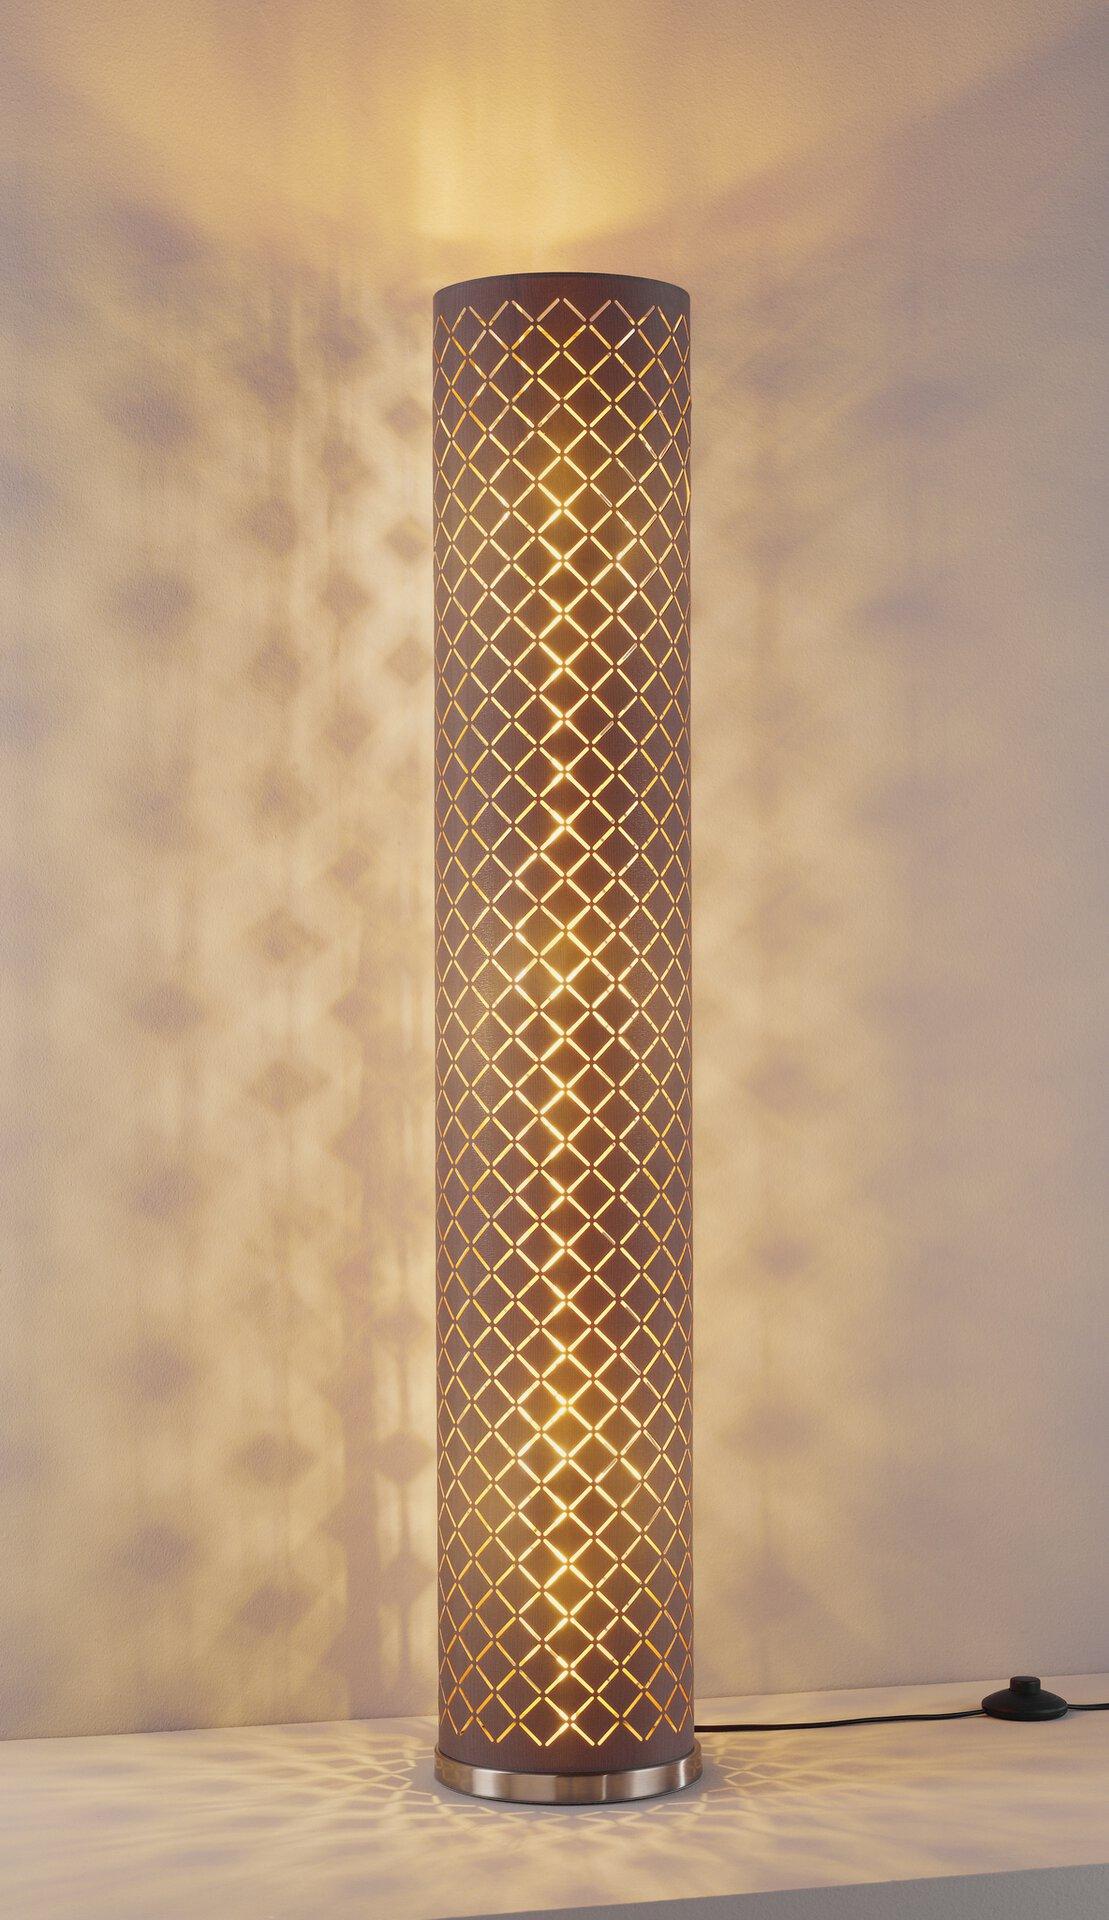 Stehleuchte Charming Casa Nova Metall mehrfarbig 20 x 110 x 20 cm